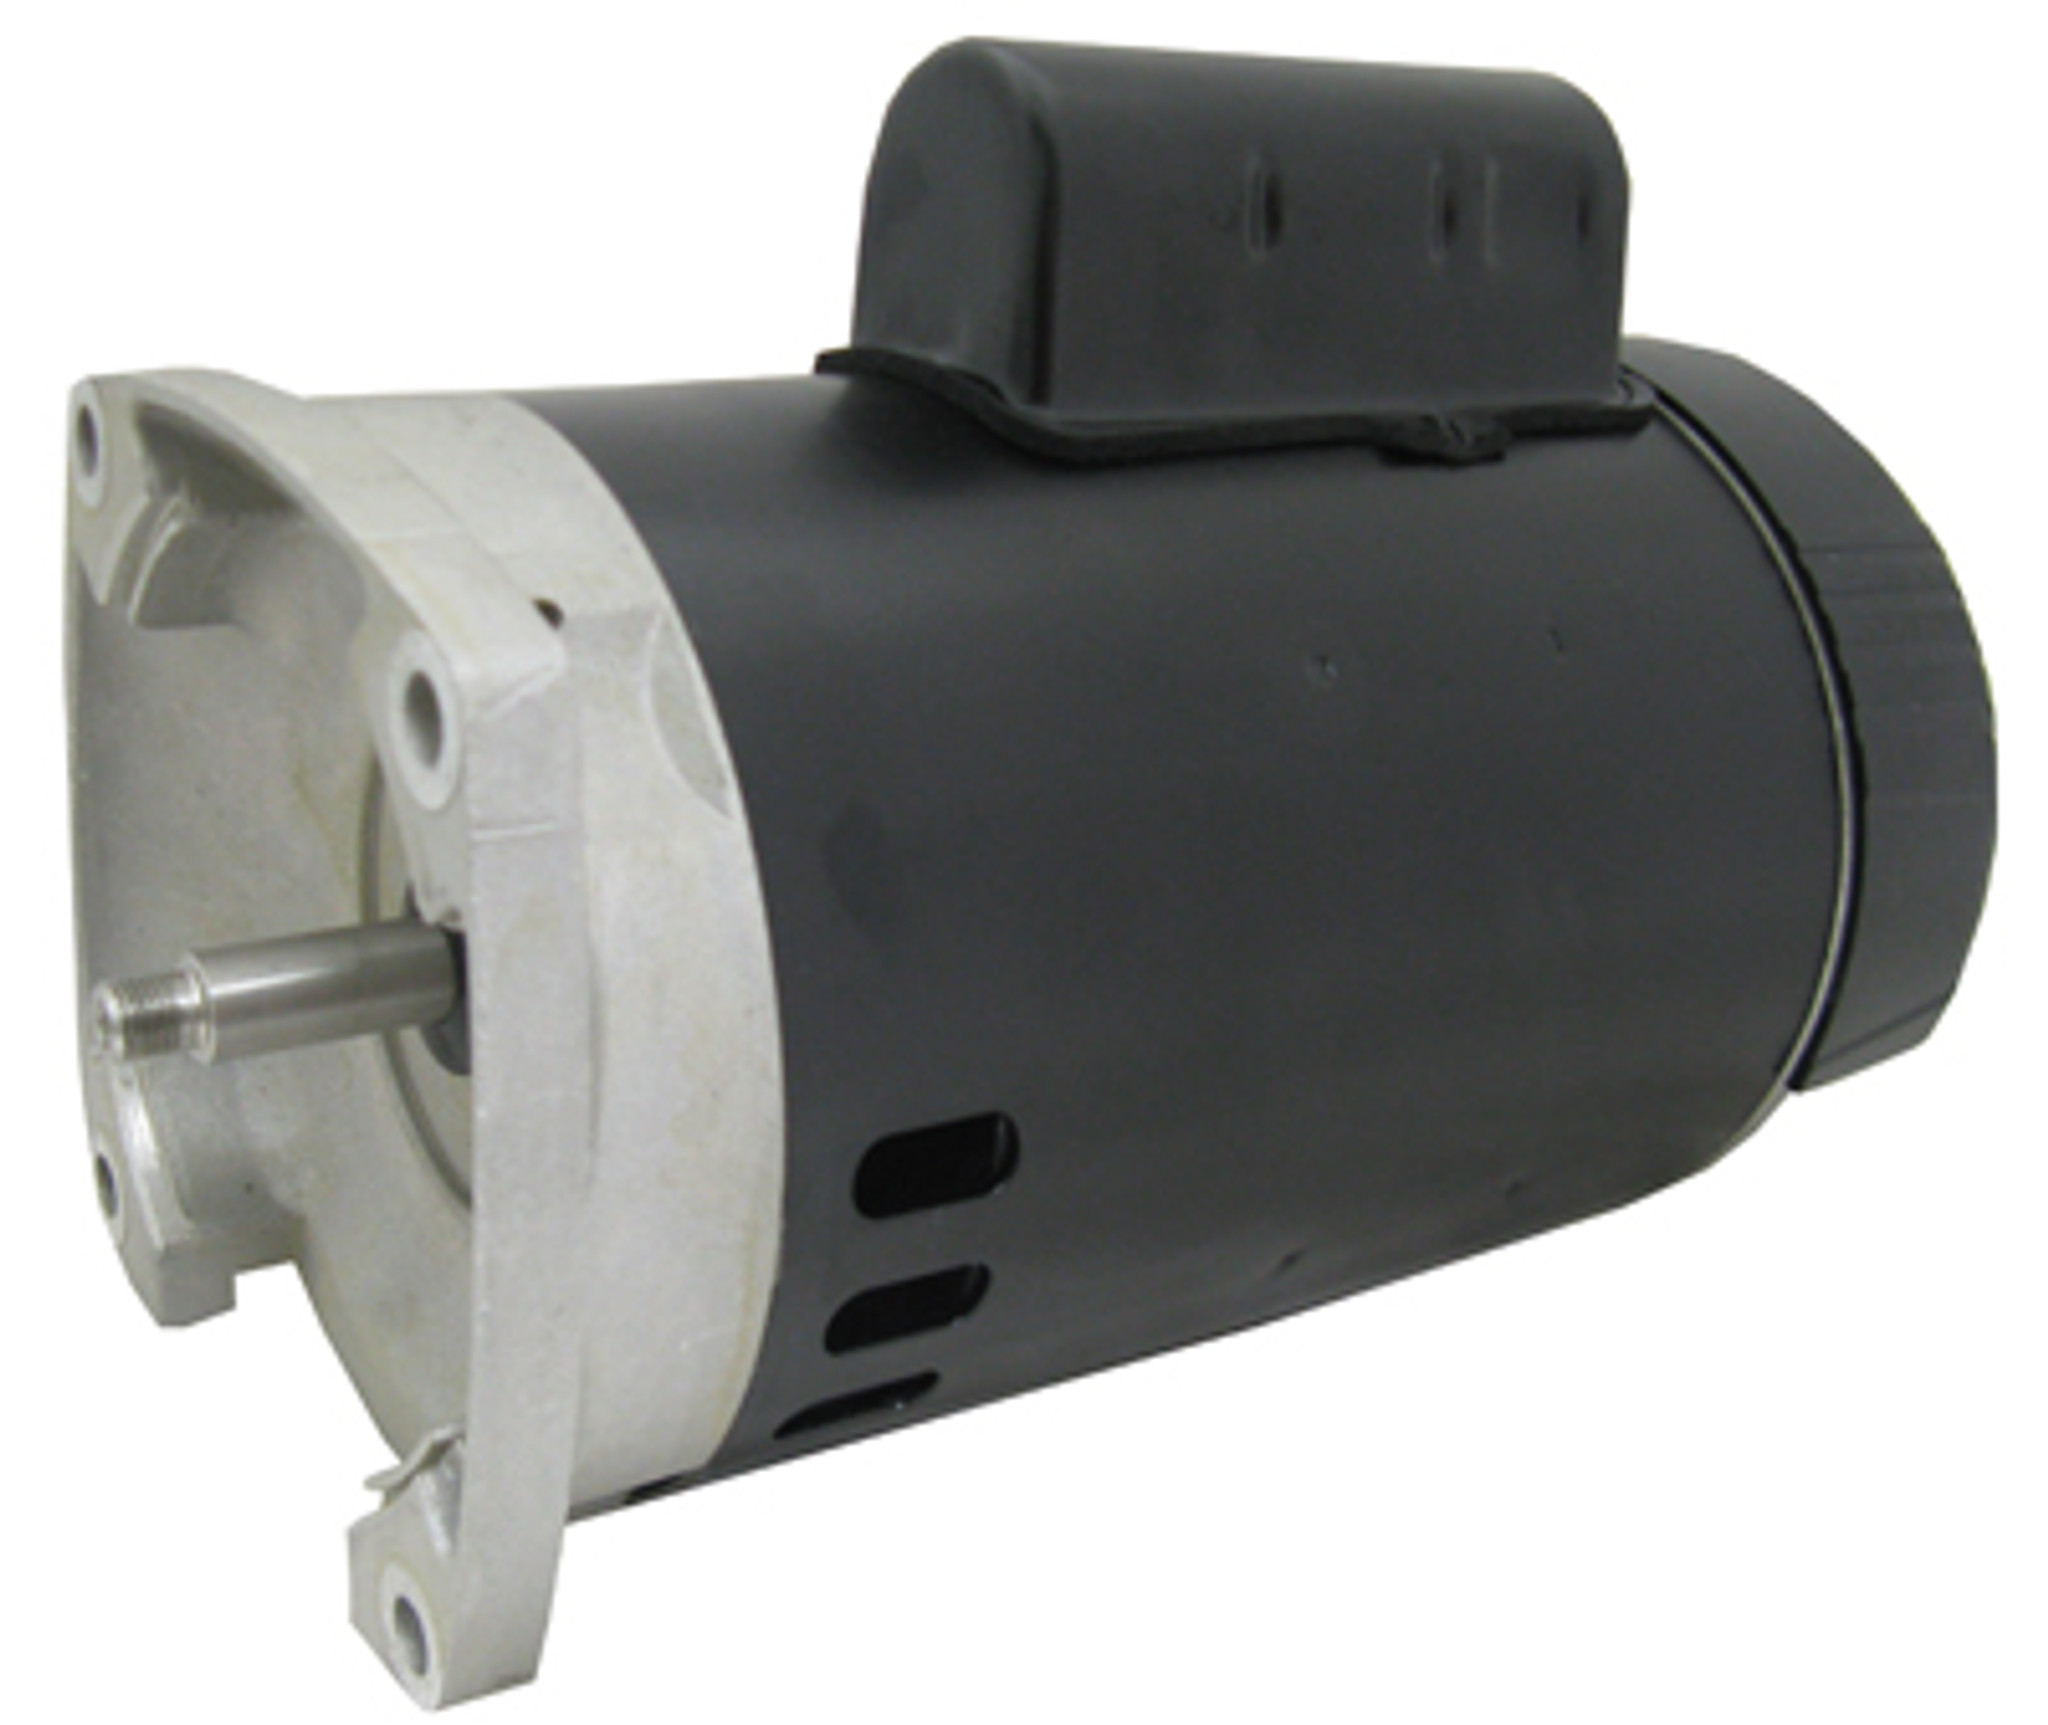 Hayward SPX3215Z1MR 2HP Standard Efficient Maxrated Motor for TriStar Pump